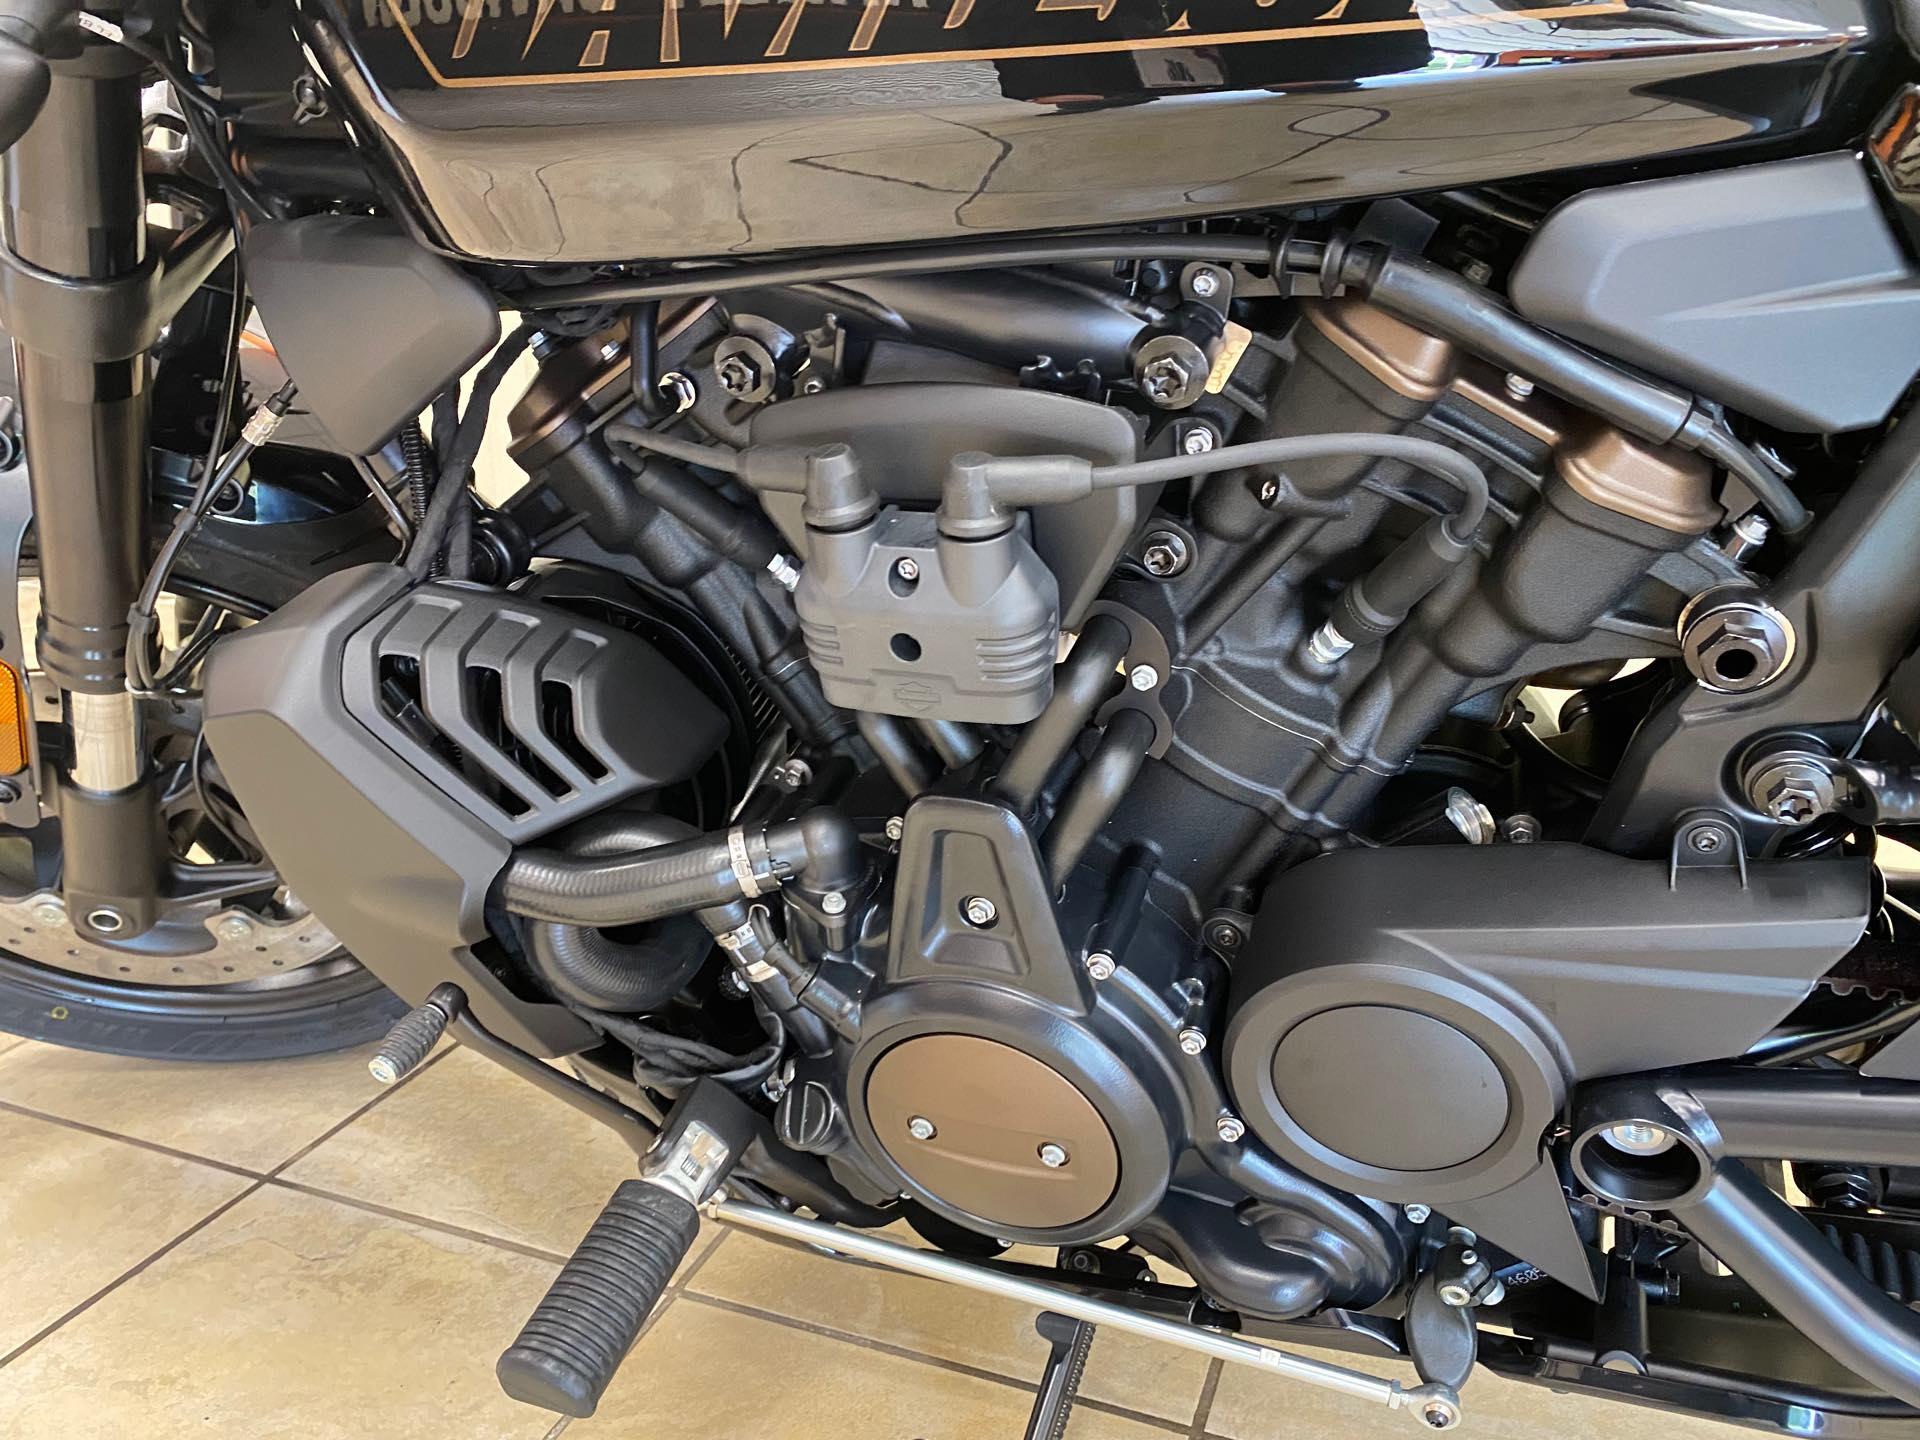 2021 Harley-Davidson Sportster S at Gold Star Harley-Davidson